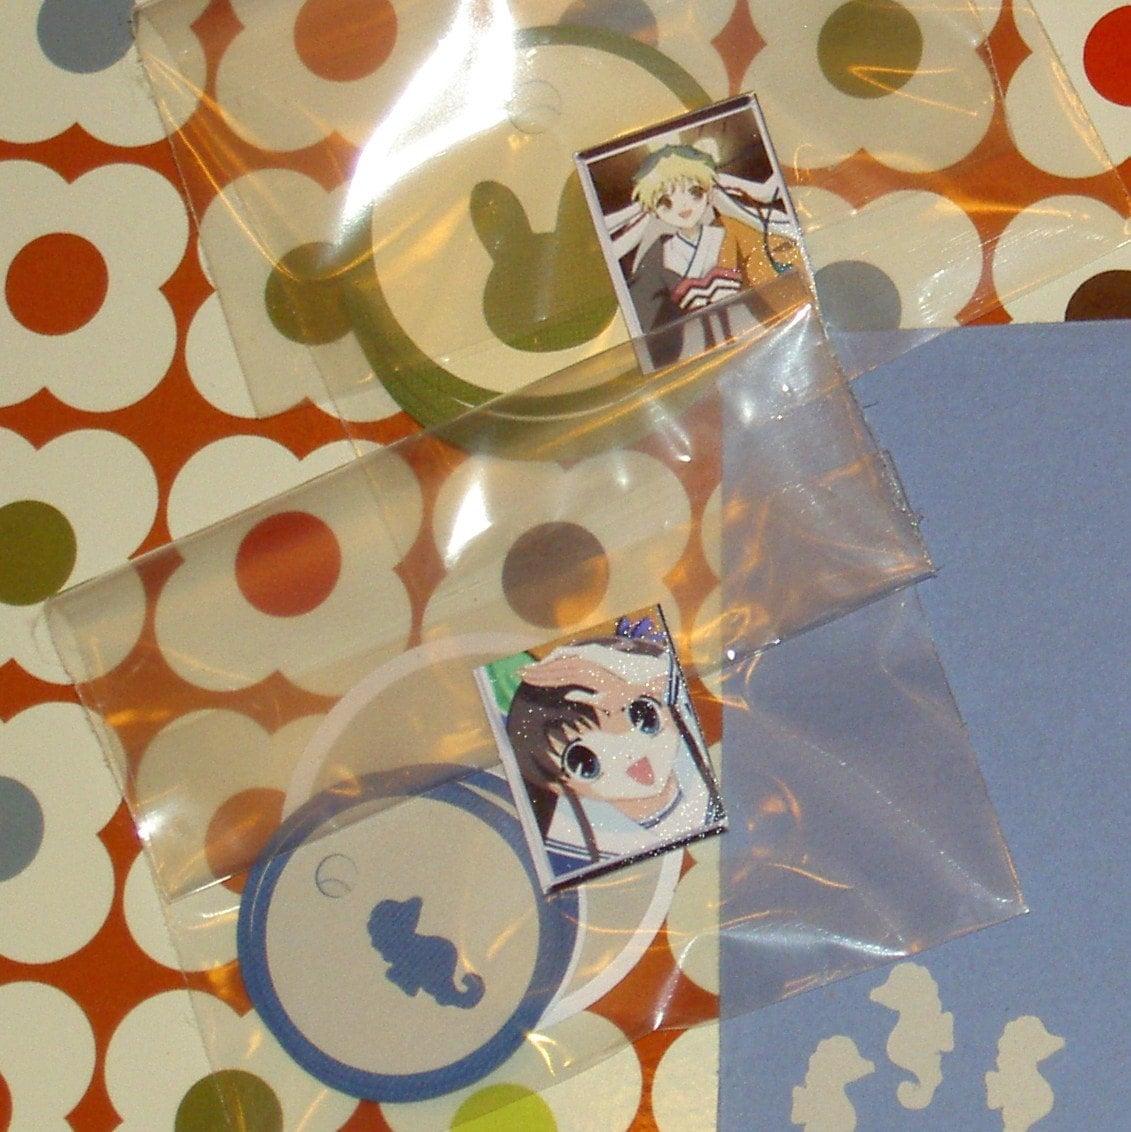 Anime Fruits Basket Bunny And Seahorse Handmade Tags